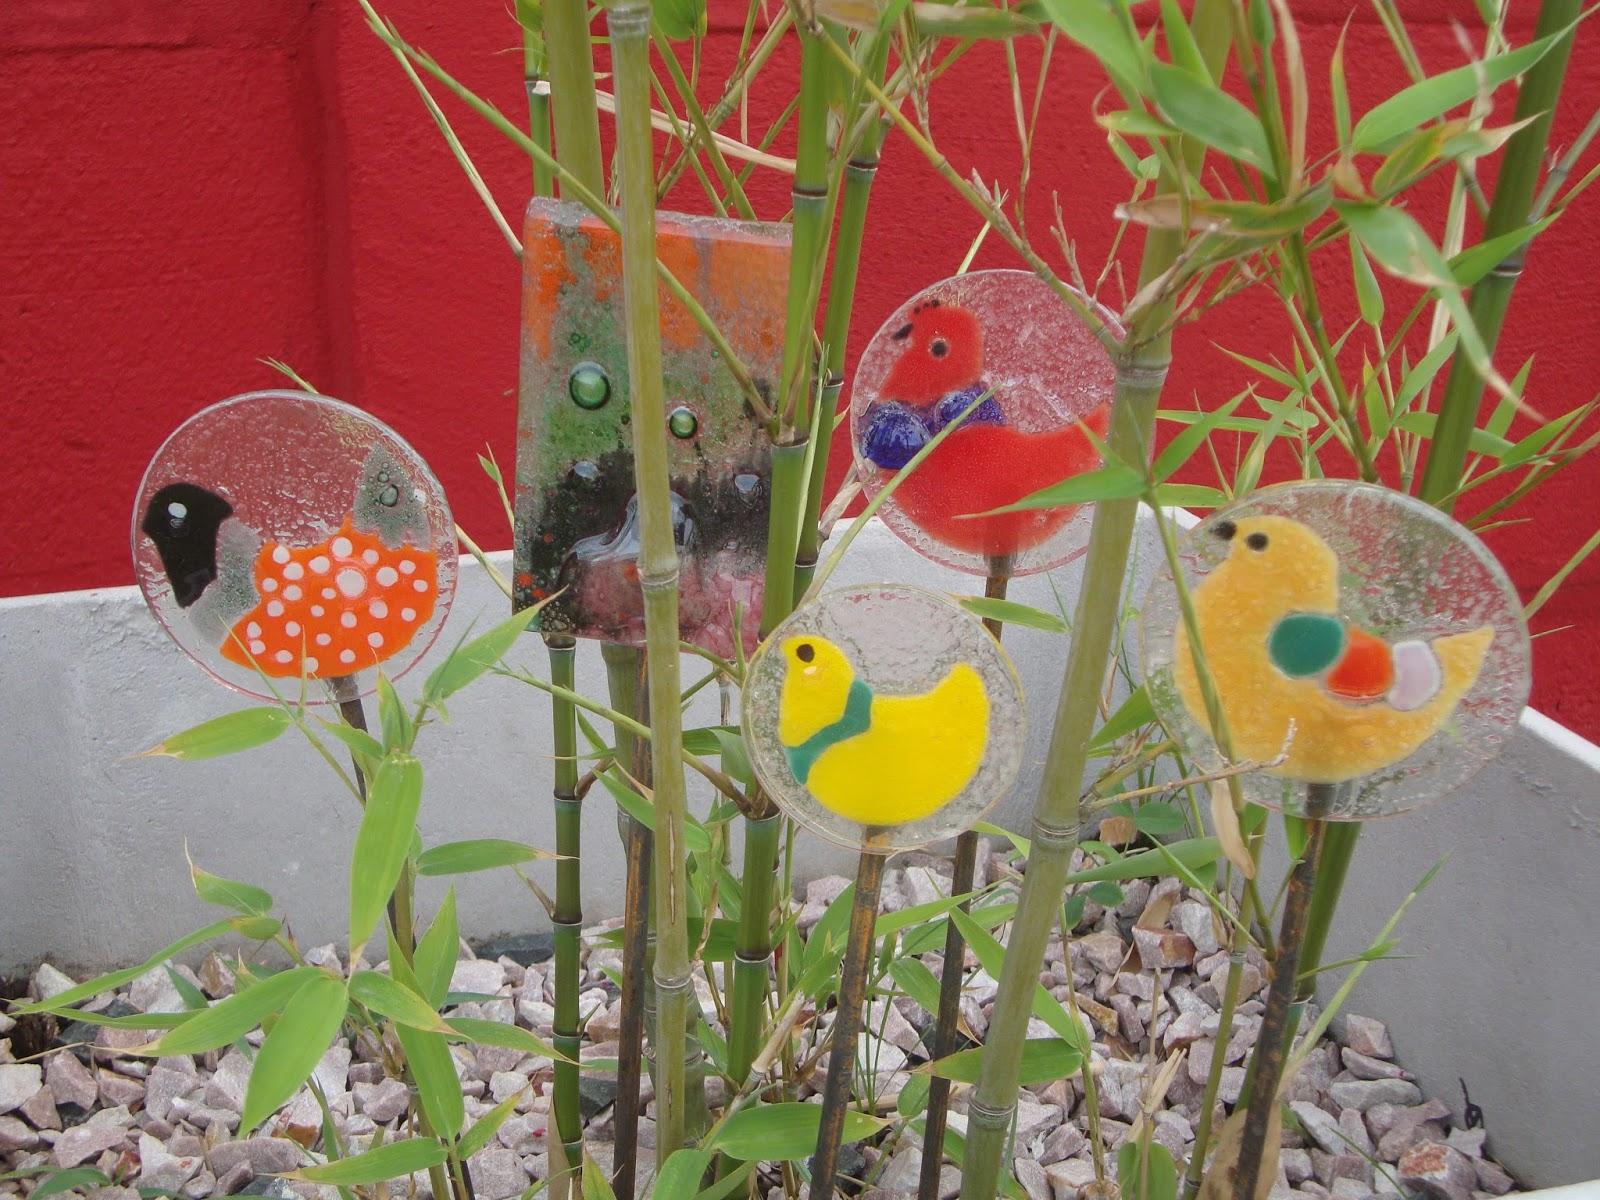 Bergiasvitro vitrofusion tutores para macetas jardin for Animales de plastico para jardin